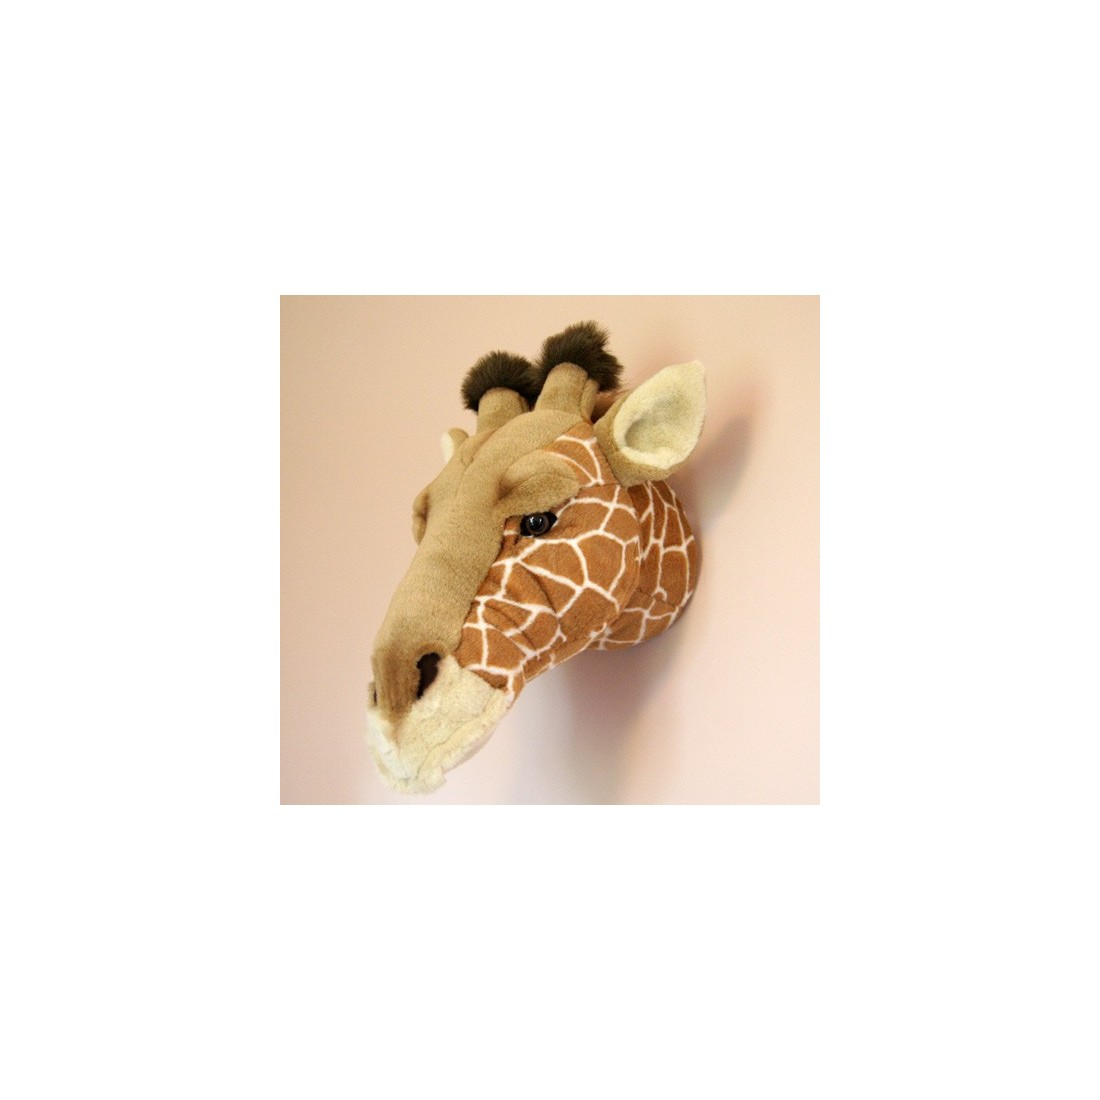 d co murale enfant peluche t te de girafe bibib ma chambramoi. Black Bedroom Furniture Sets. Home Design Ideas